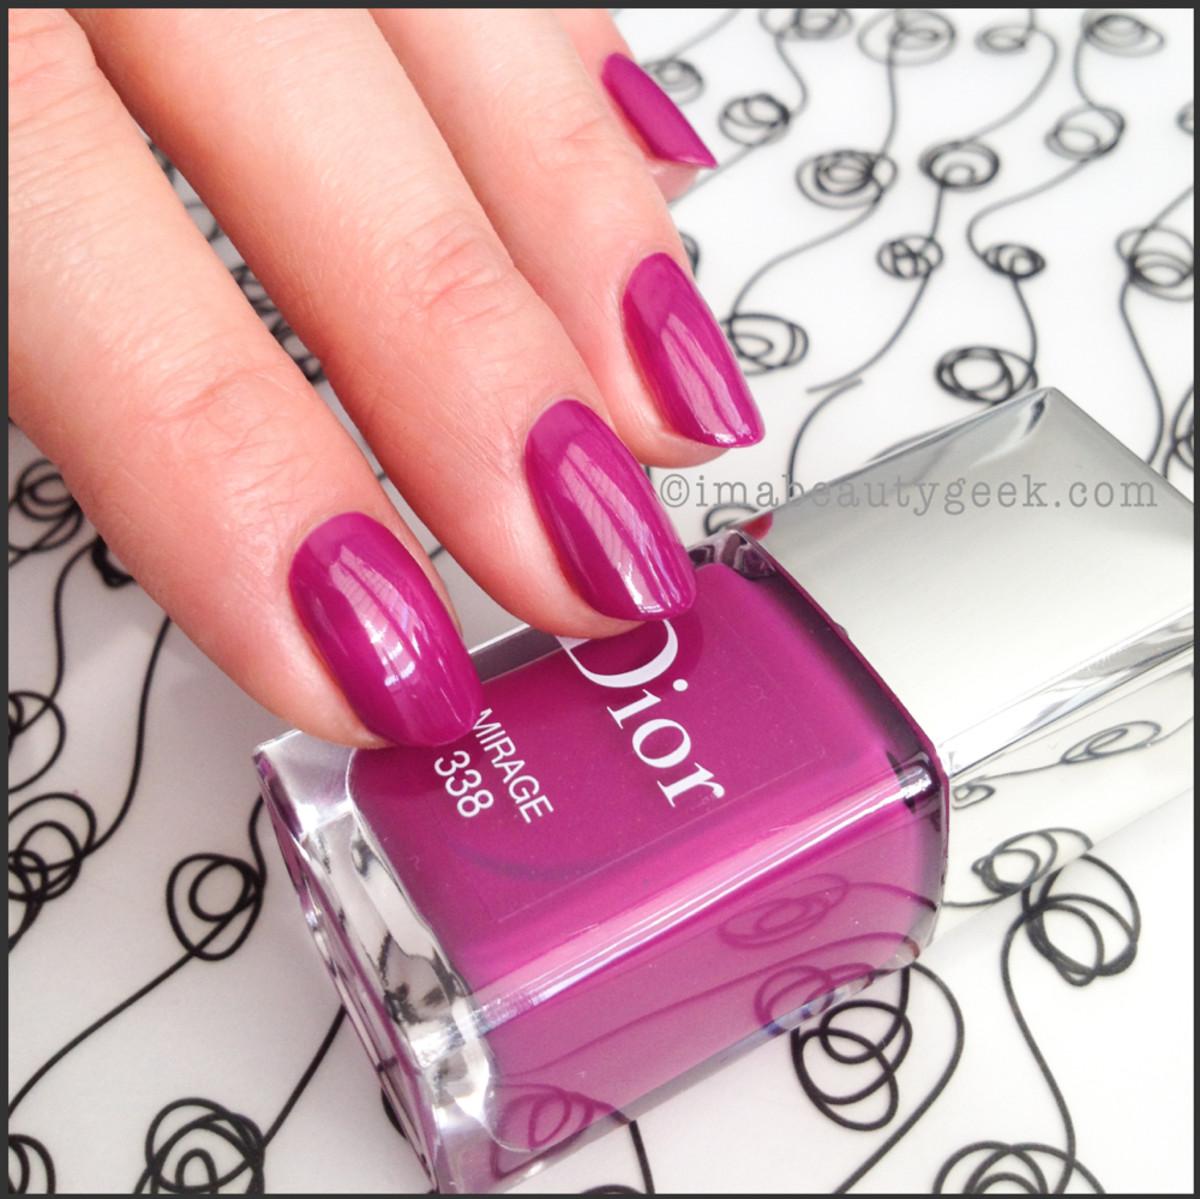 Dior polish Mirage 338 spring 2014_Dior Gel Shine